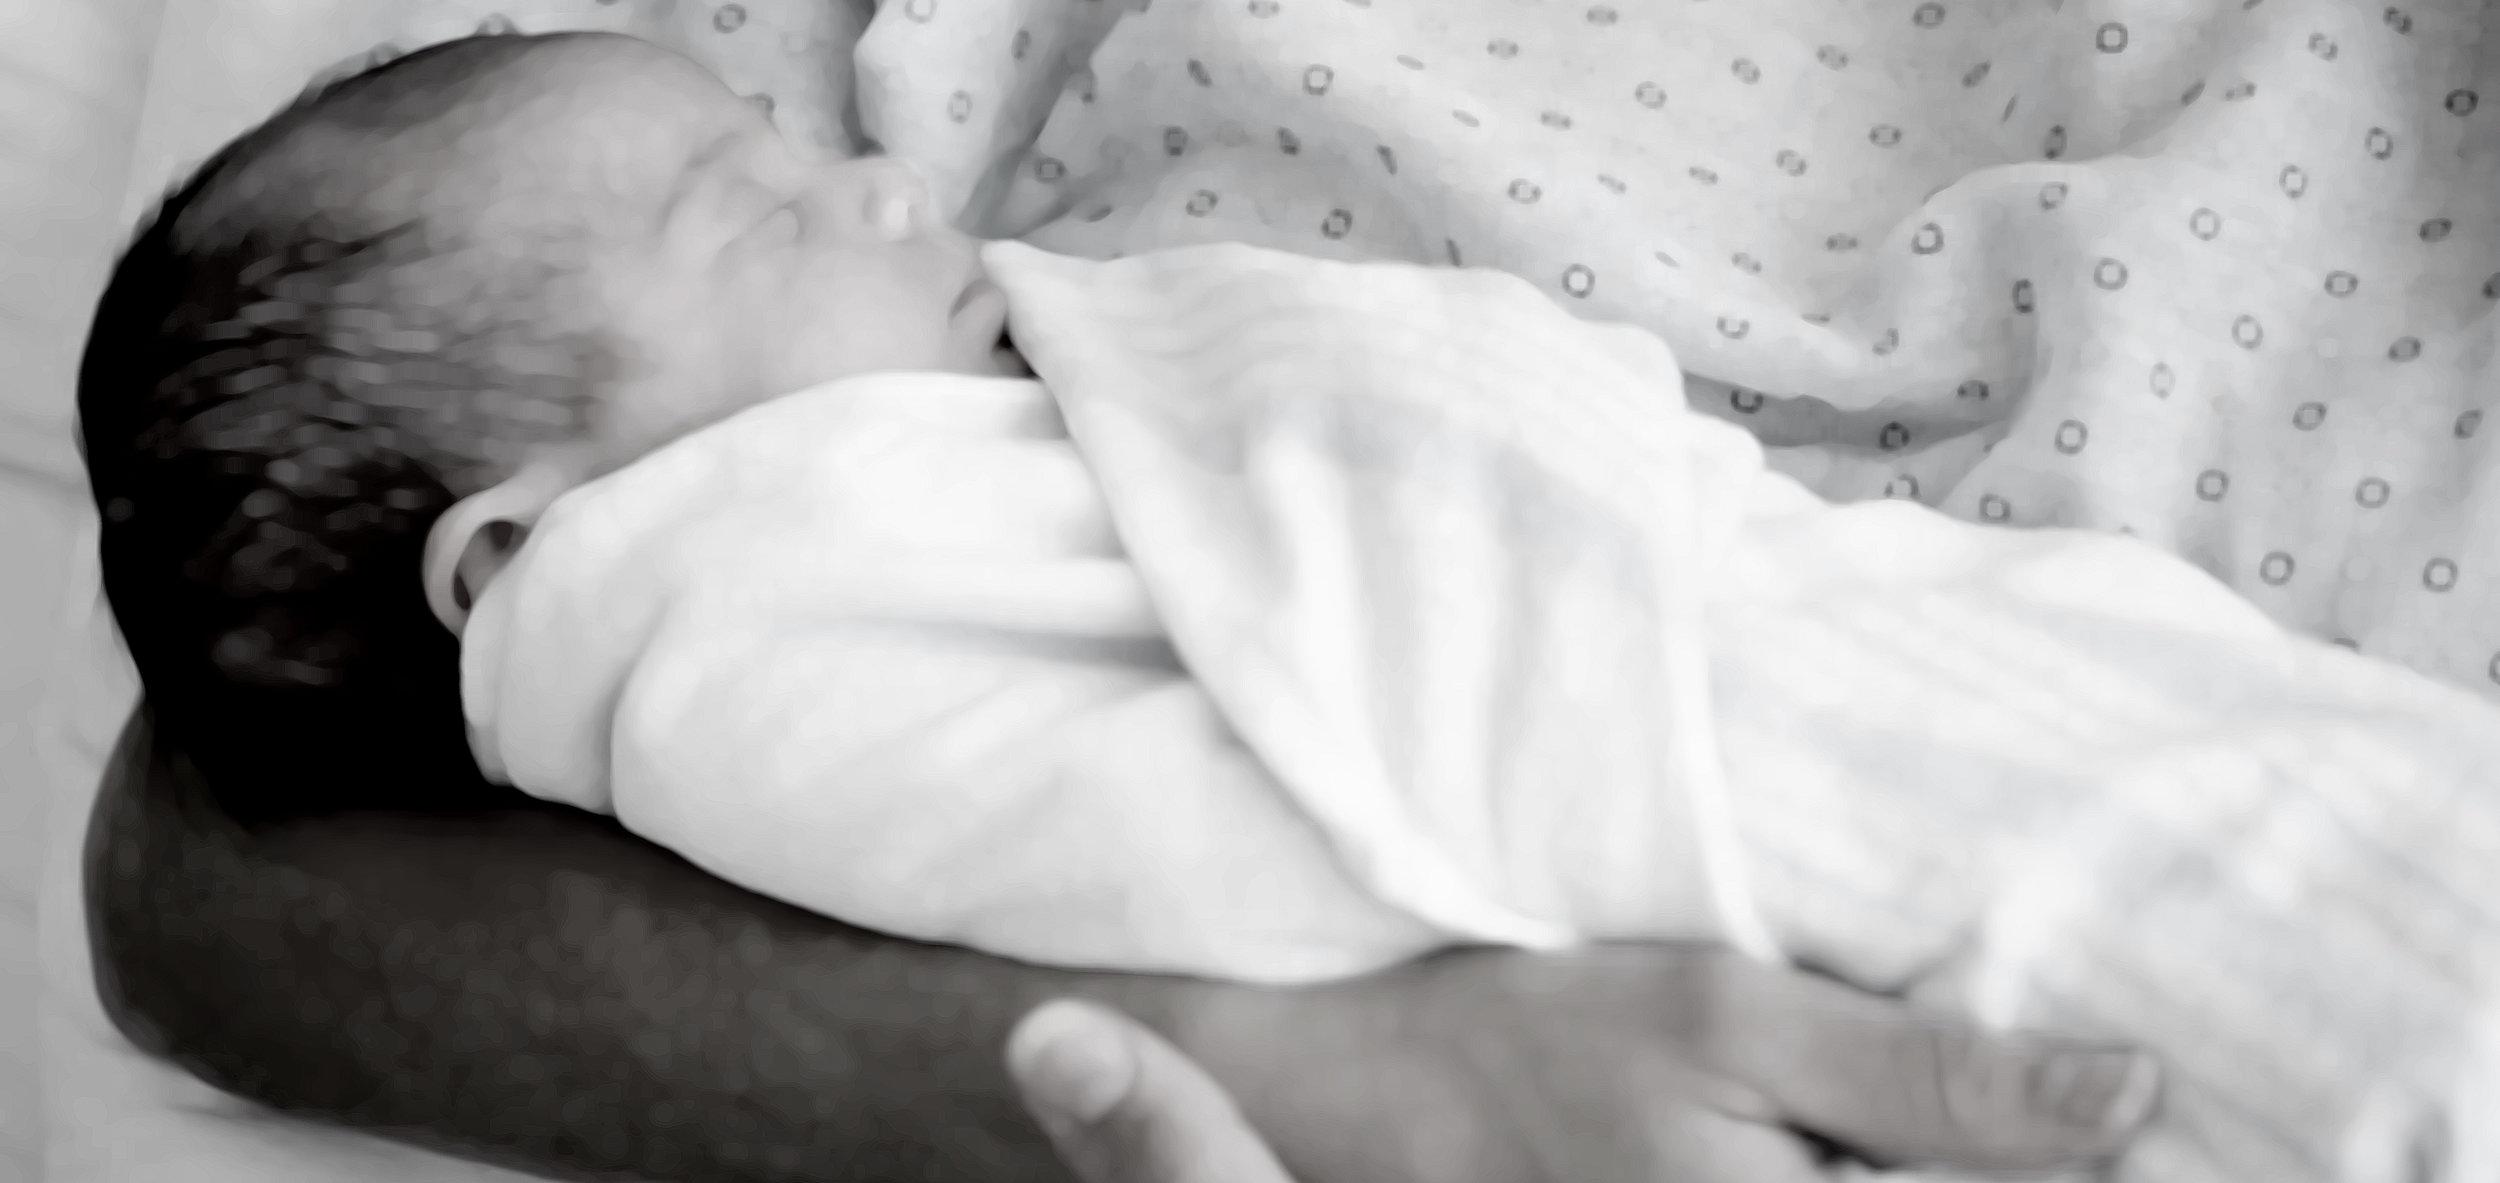 newborn baby new orleans child custody attorney louisiana